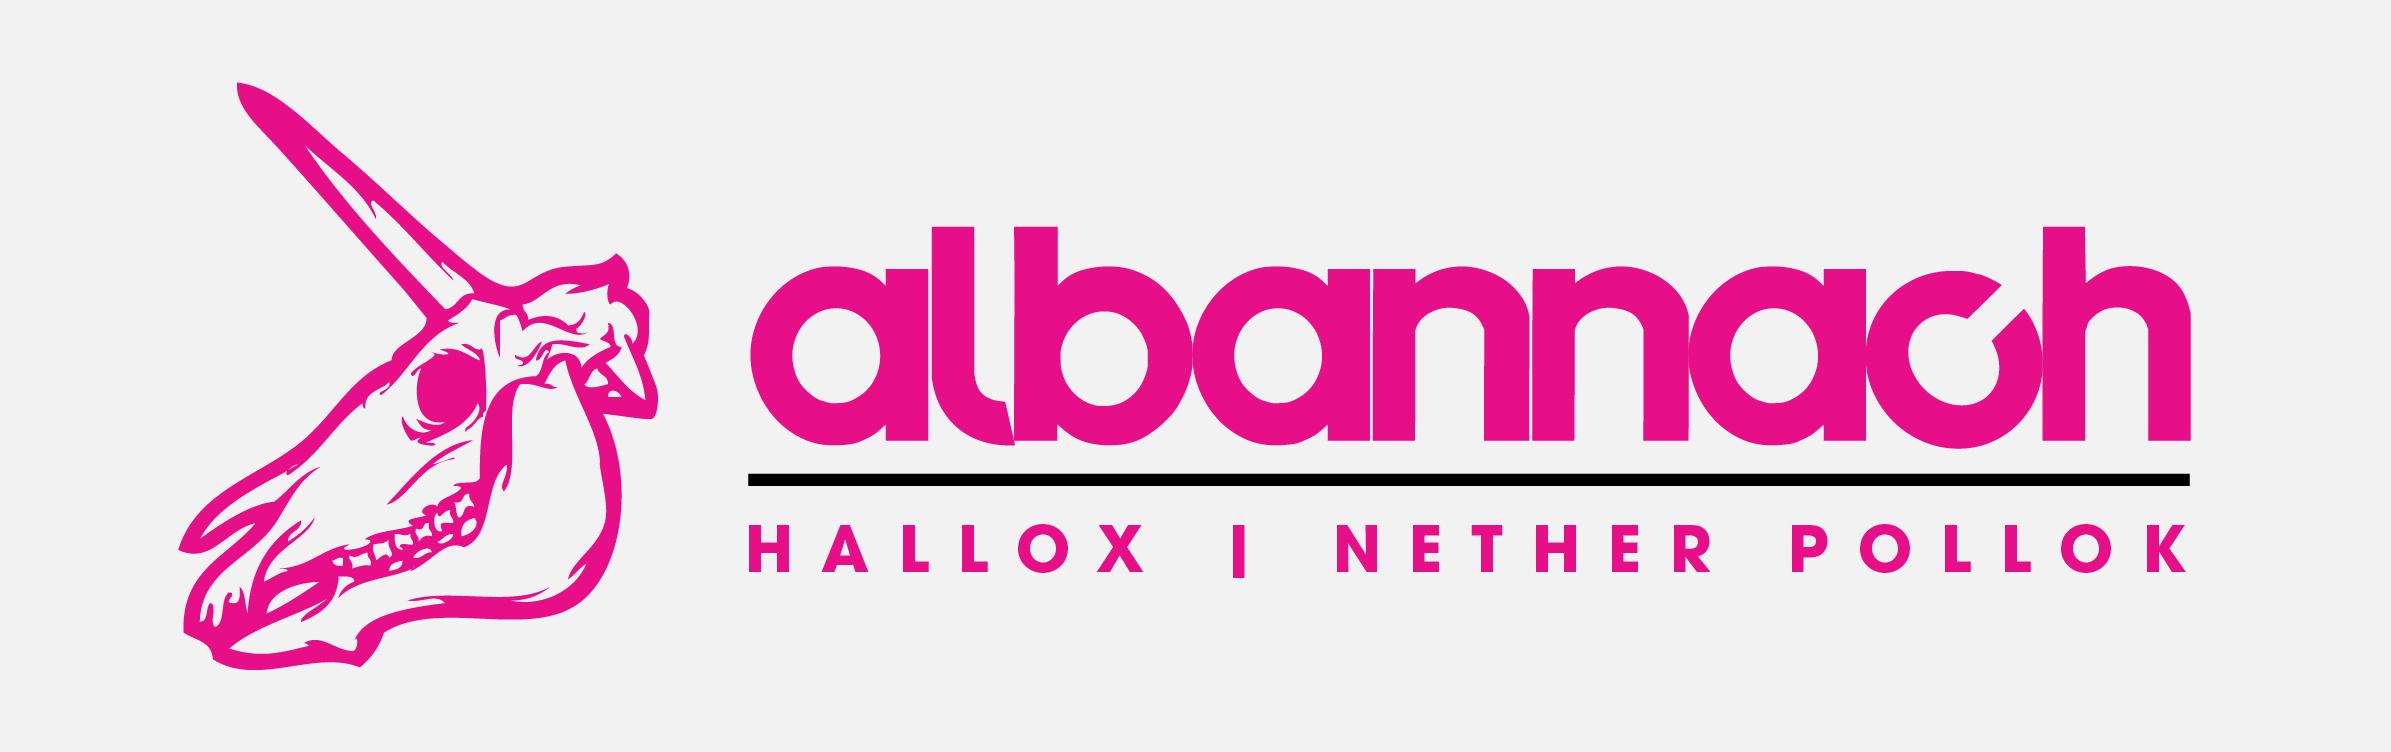 hallox-page-banner